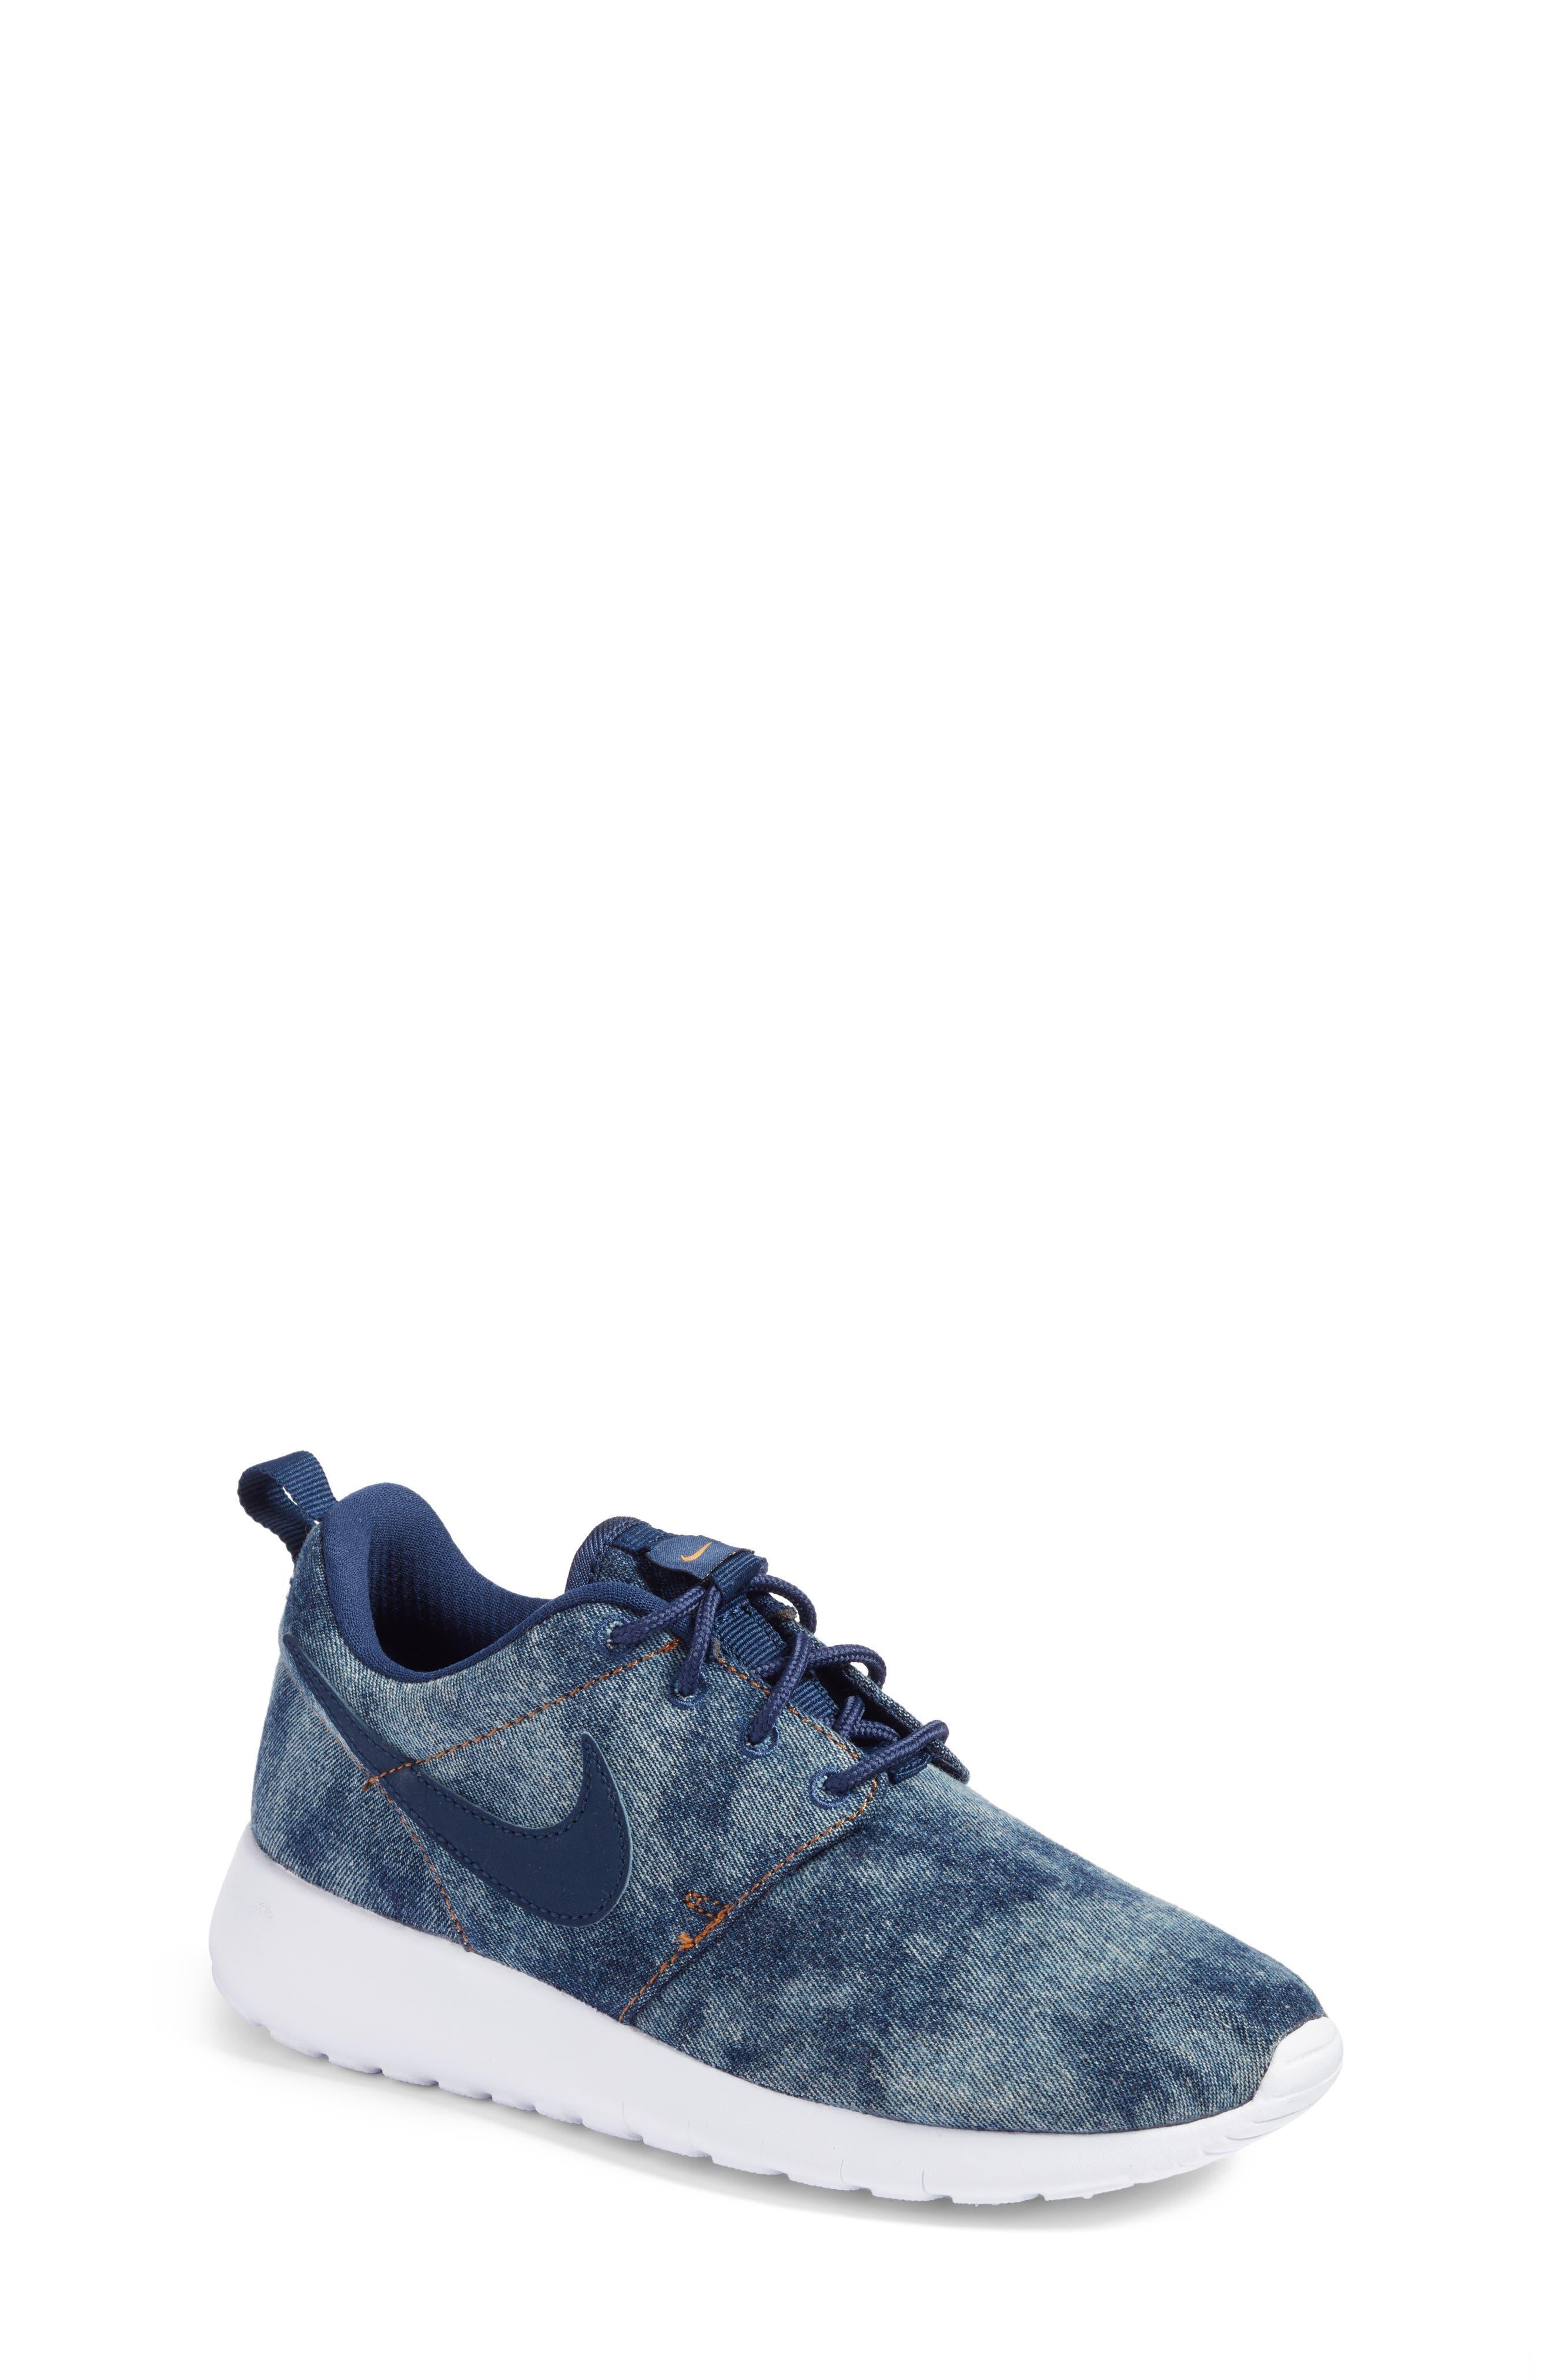 Nike Roshe One SE Sneaker (Big Kid)